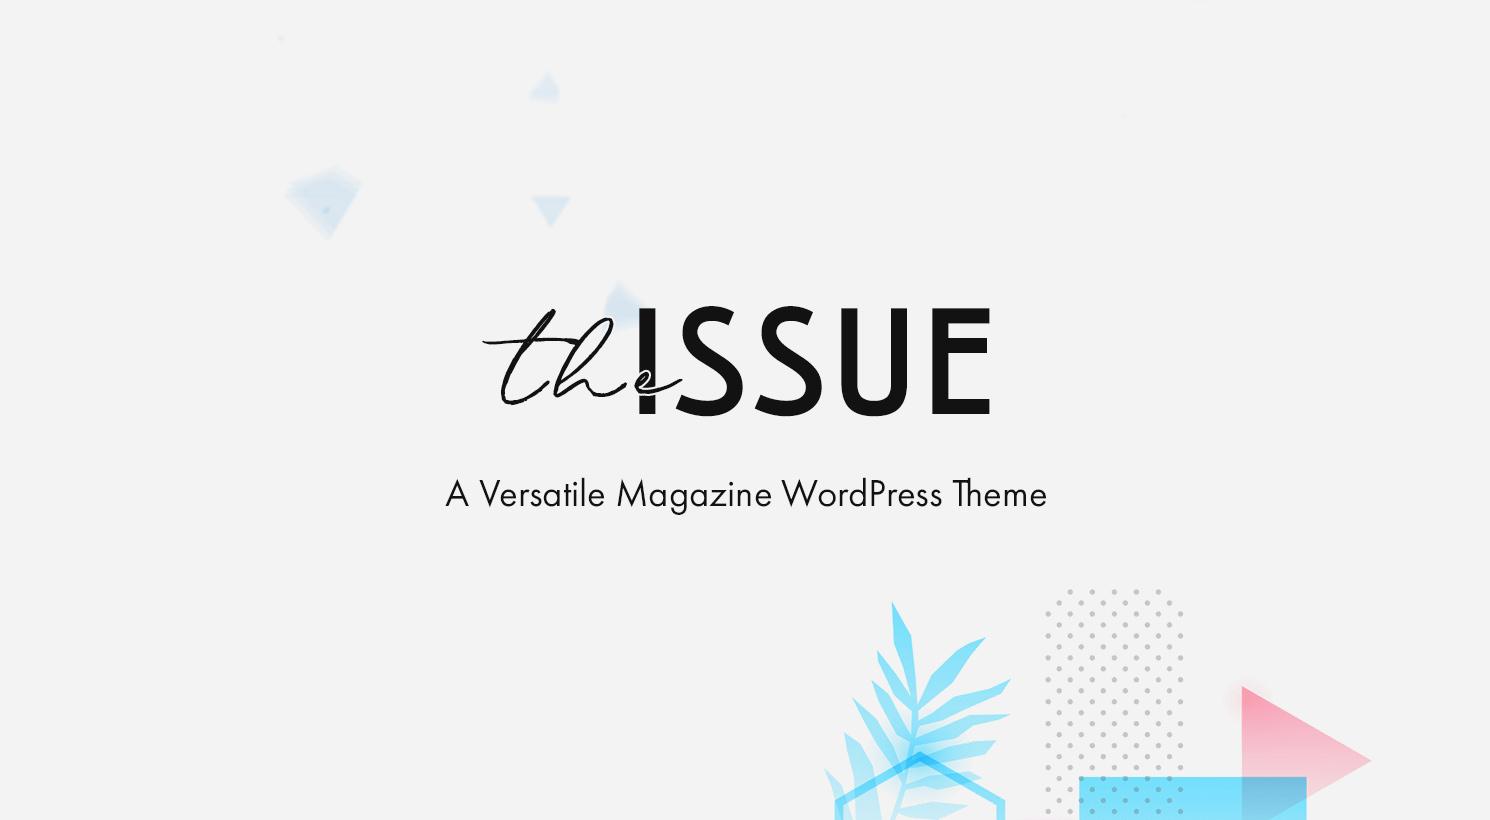 The Issue - Versatile Magazine Theme